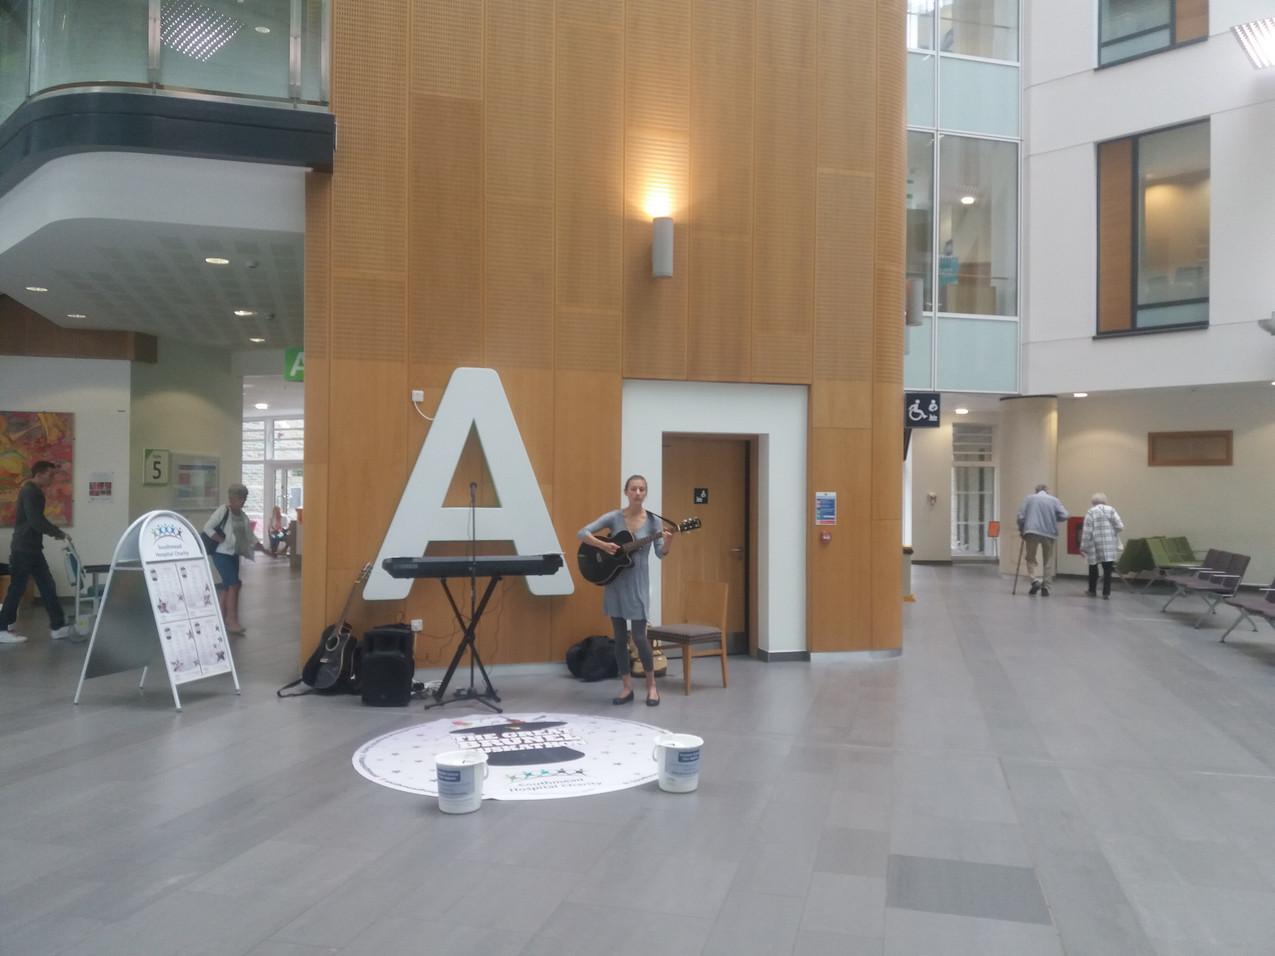 Hospital Atrium Music Performance